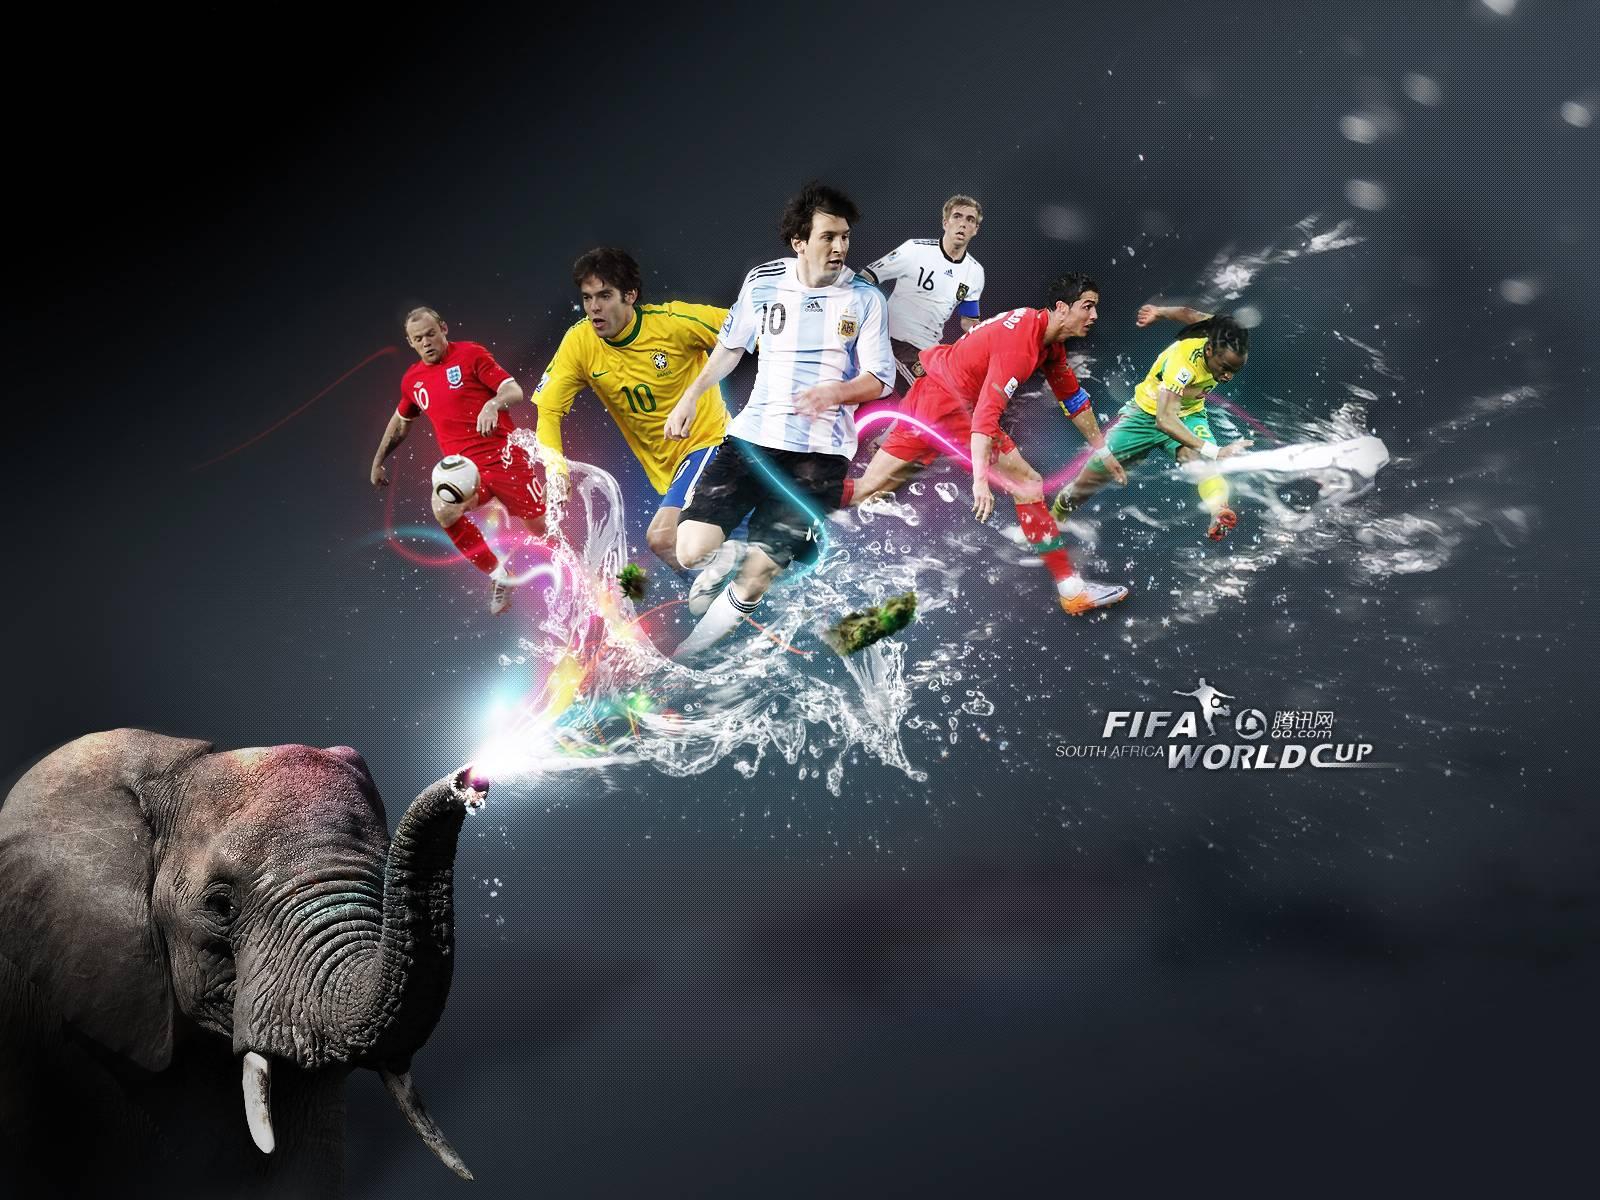 Fifa Wallpapers Wallpaper Cave